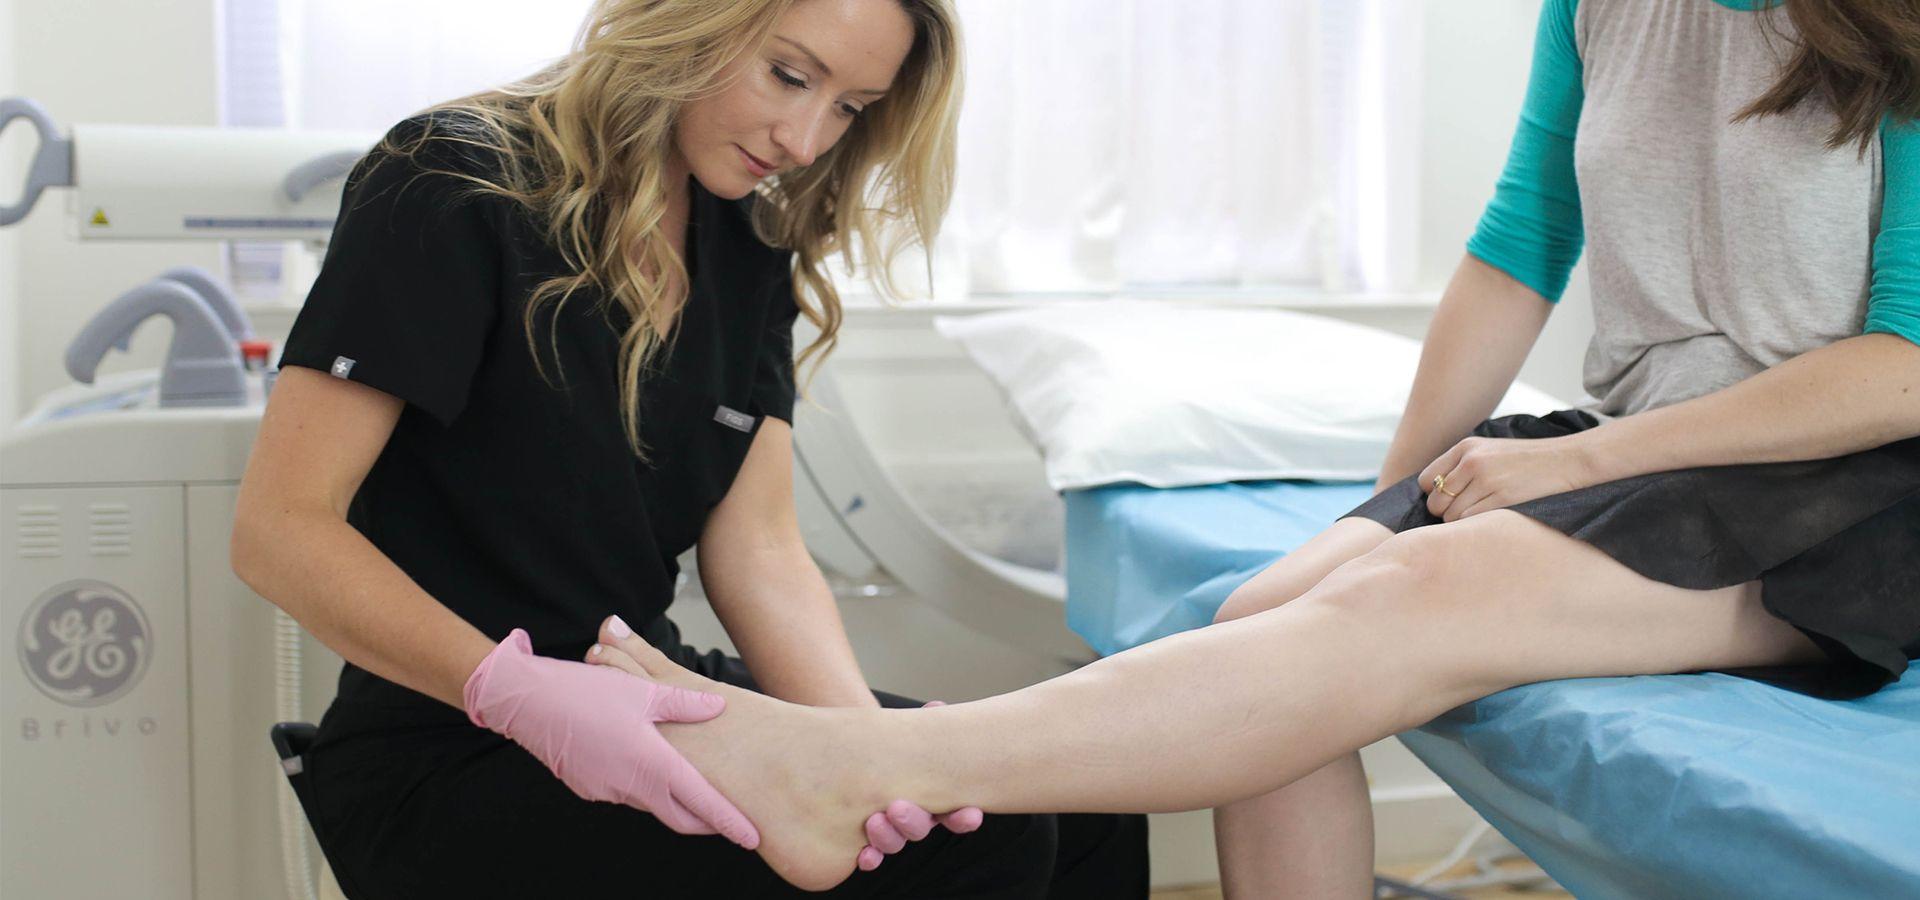 Dr.-Novak-examining-a-patient.jpg